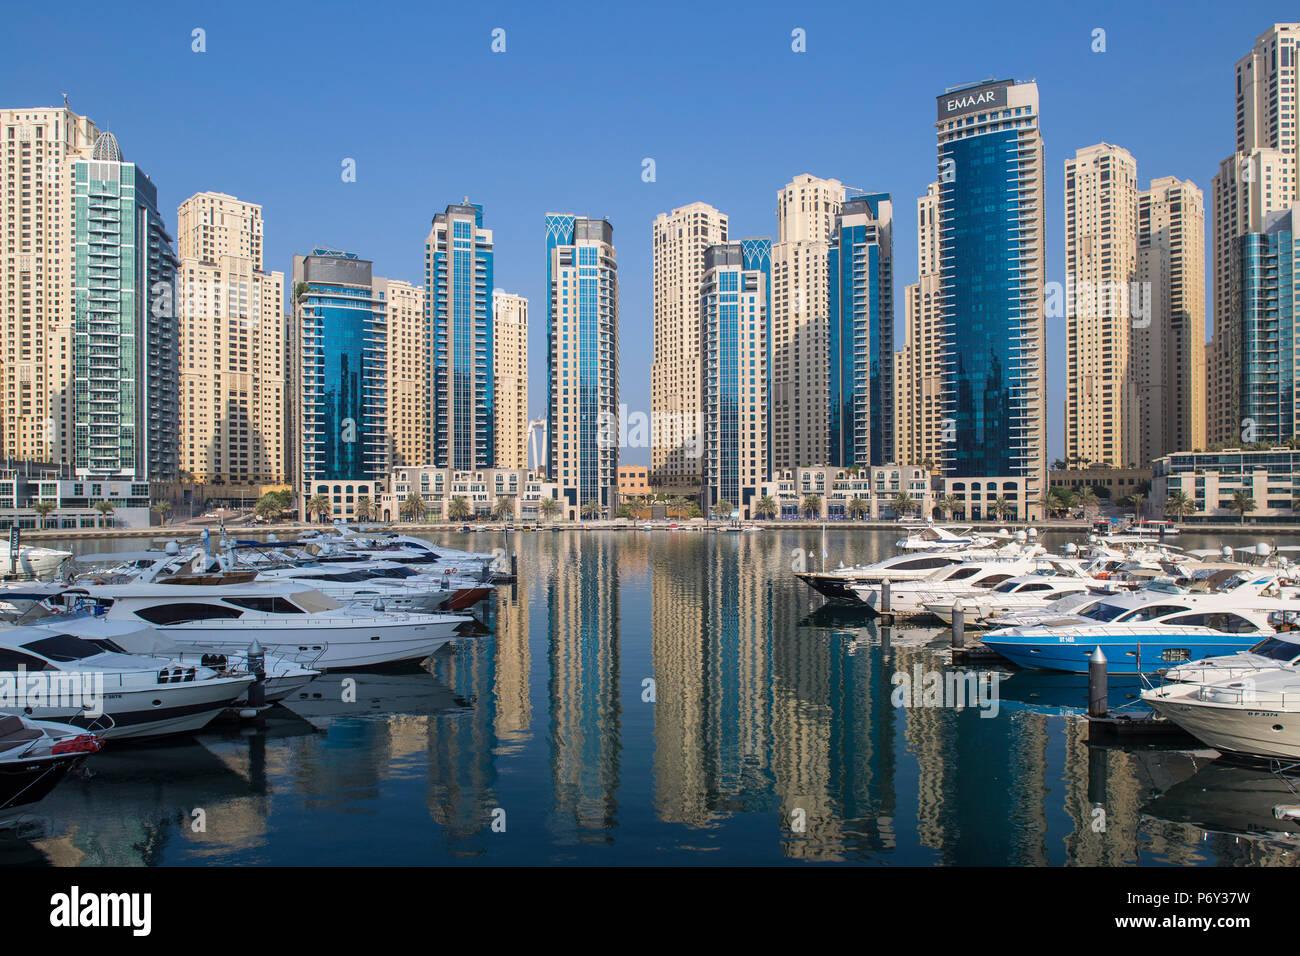 Los Emiratos Árabes Unidos, Dubai, Dubai Marina Imagen De Stock